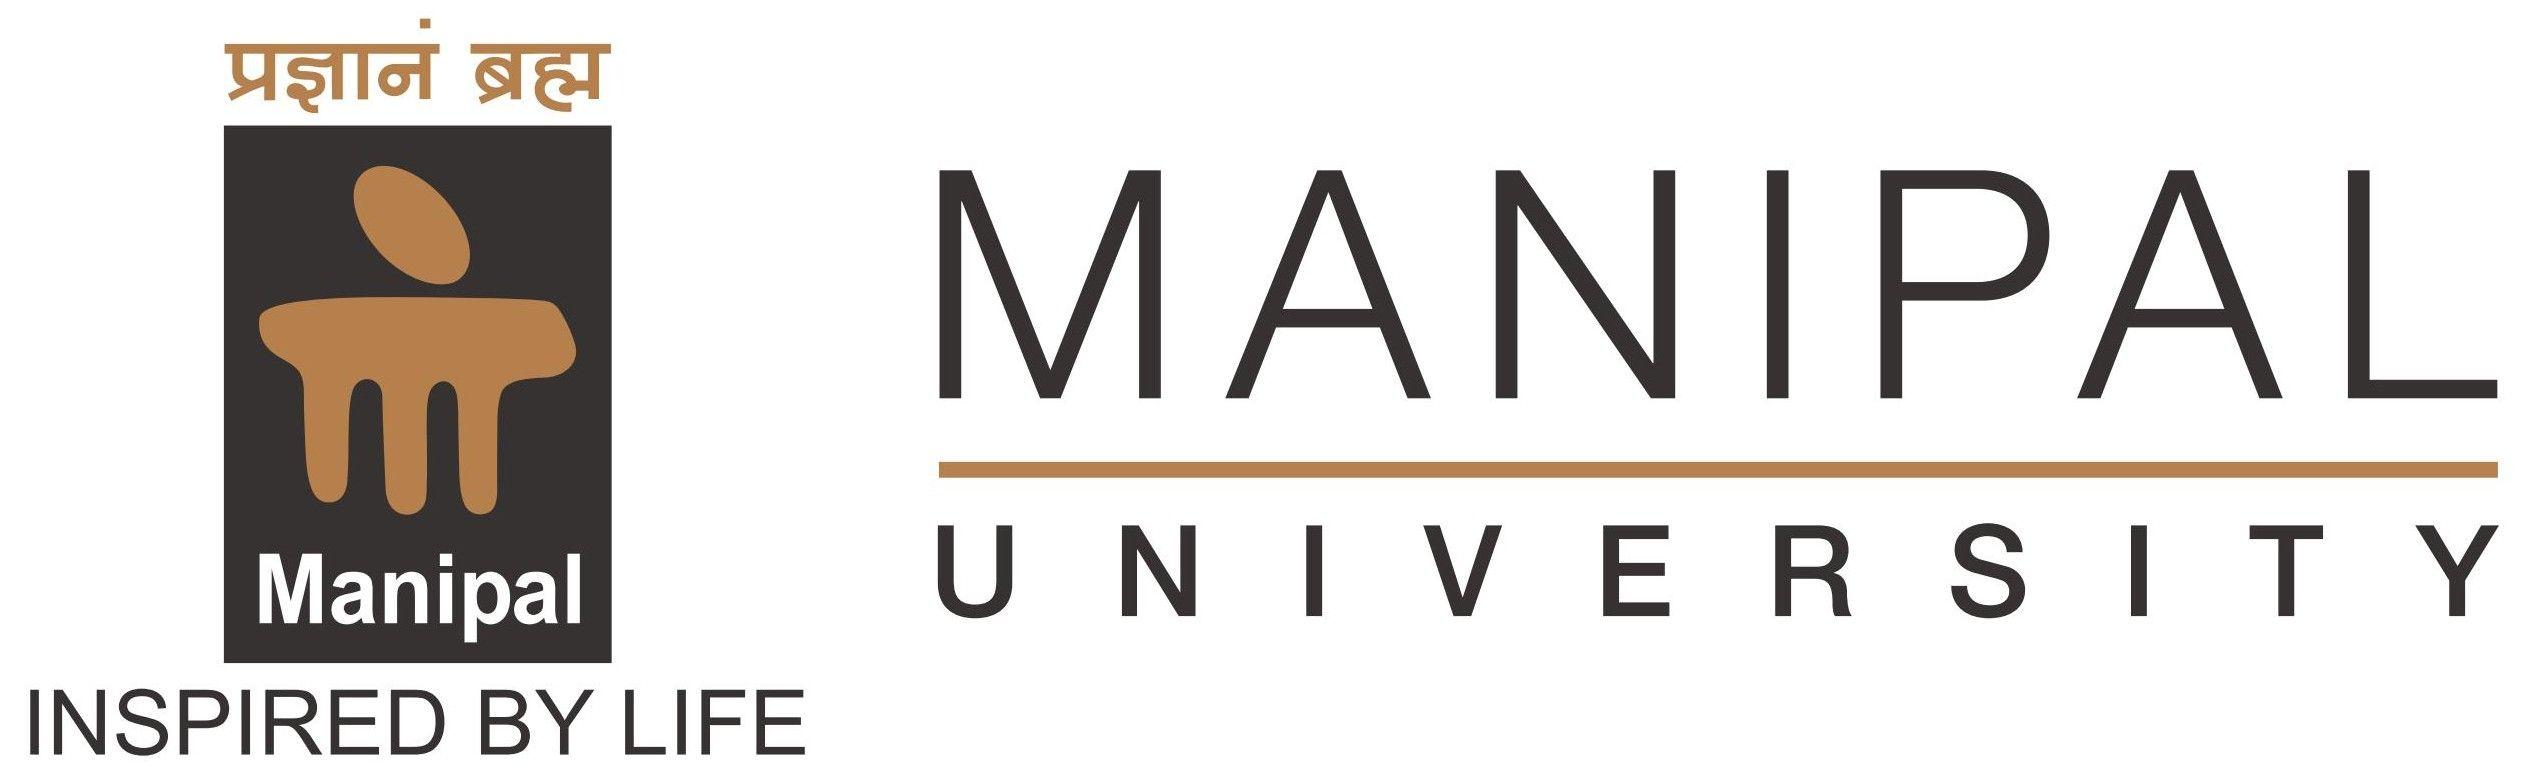 Manipal University Logo [EPS File] Download Vector